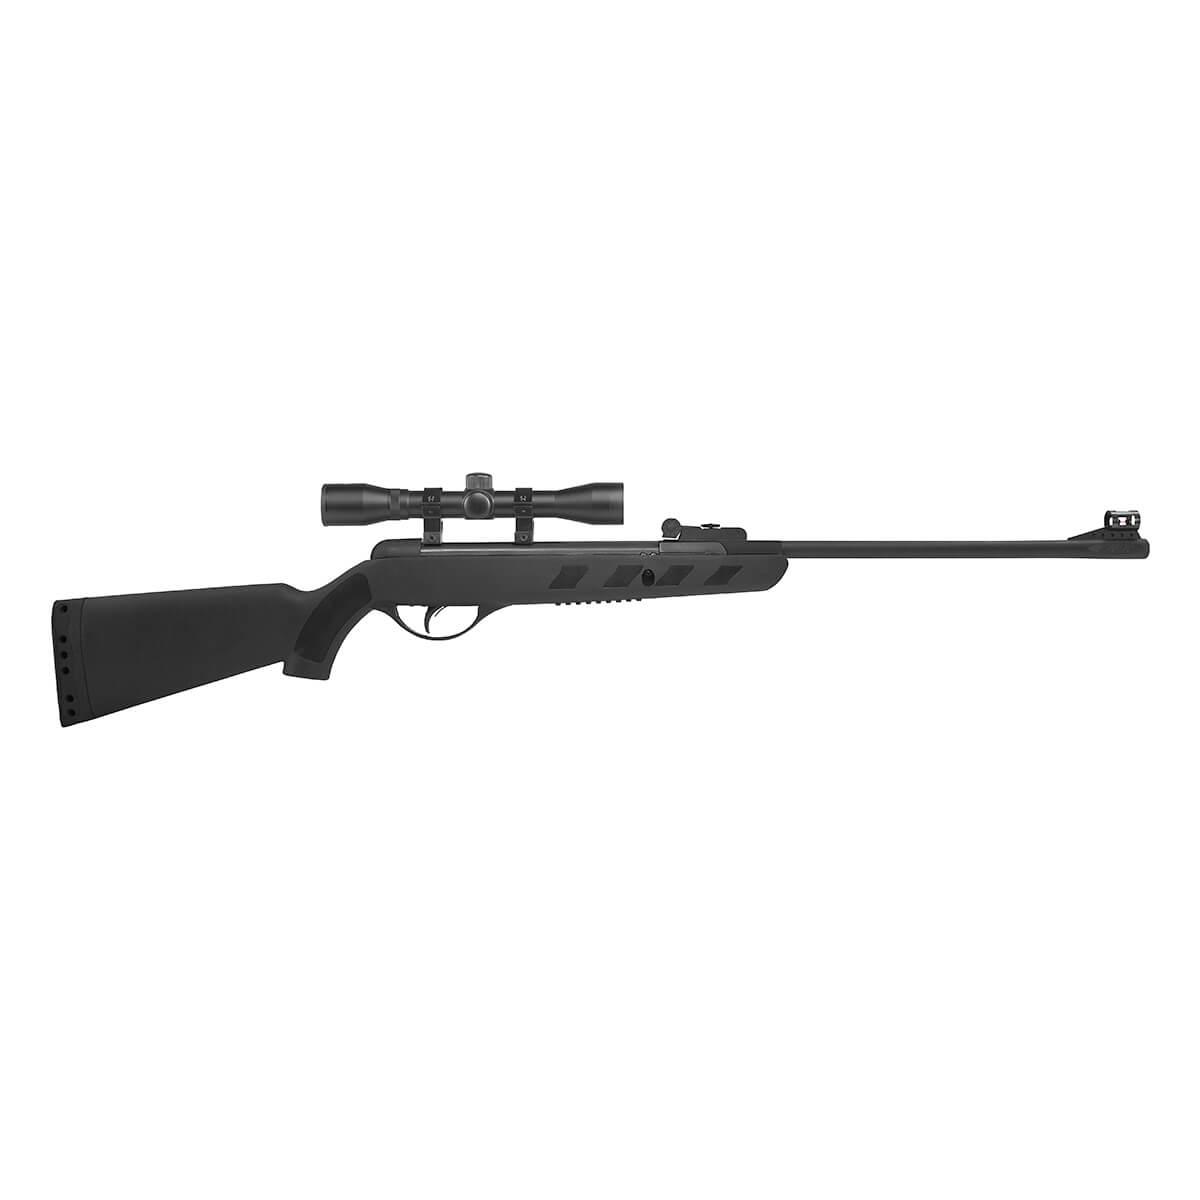 Winchester 500 S Break Barrel .177cal Air Gun with 4 x 32 Power Scope